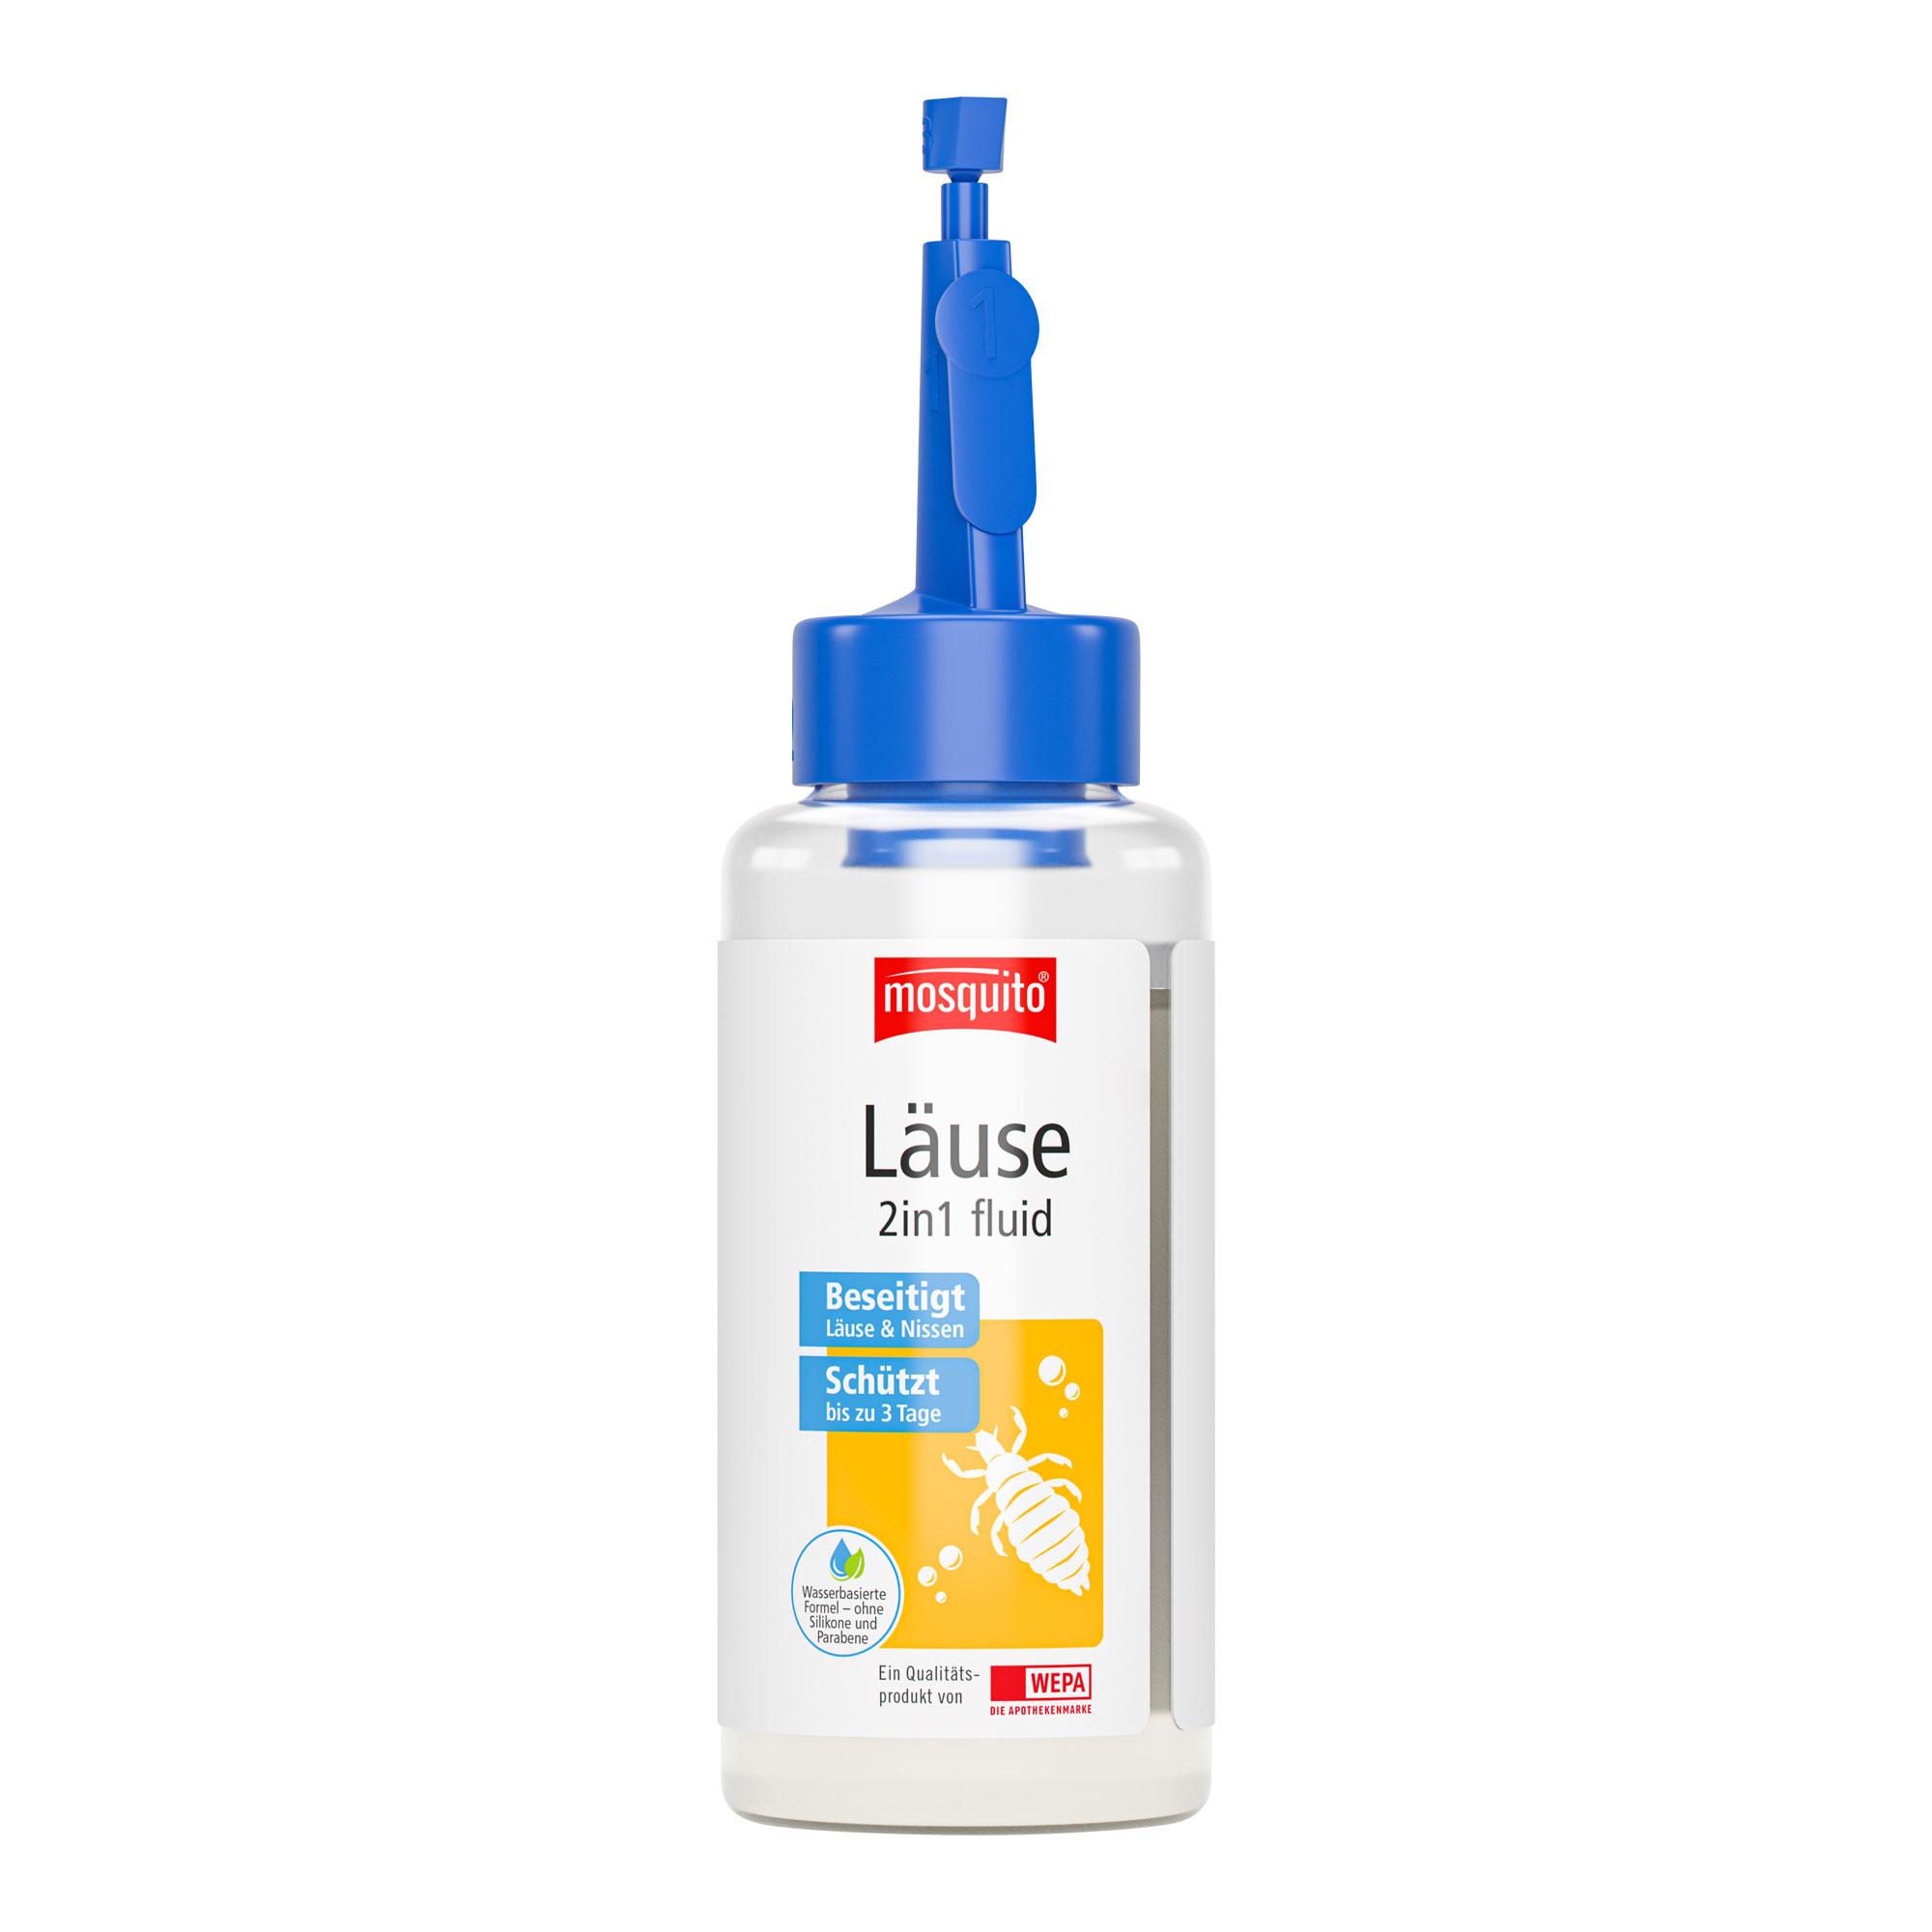 Mosquito Läuse 2in1 Fluid